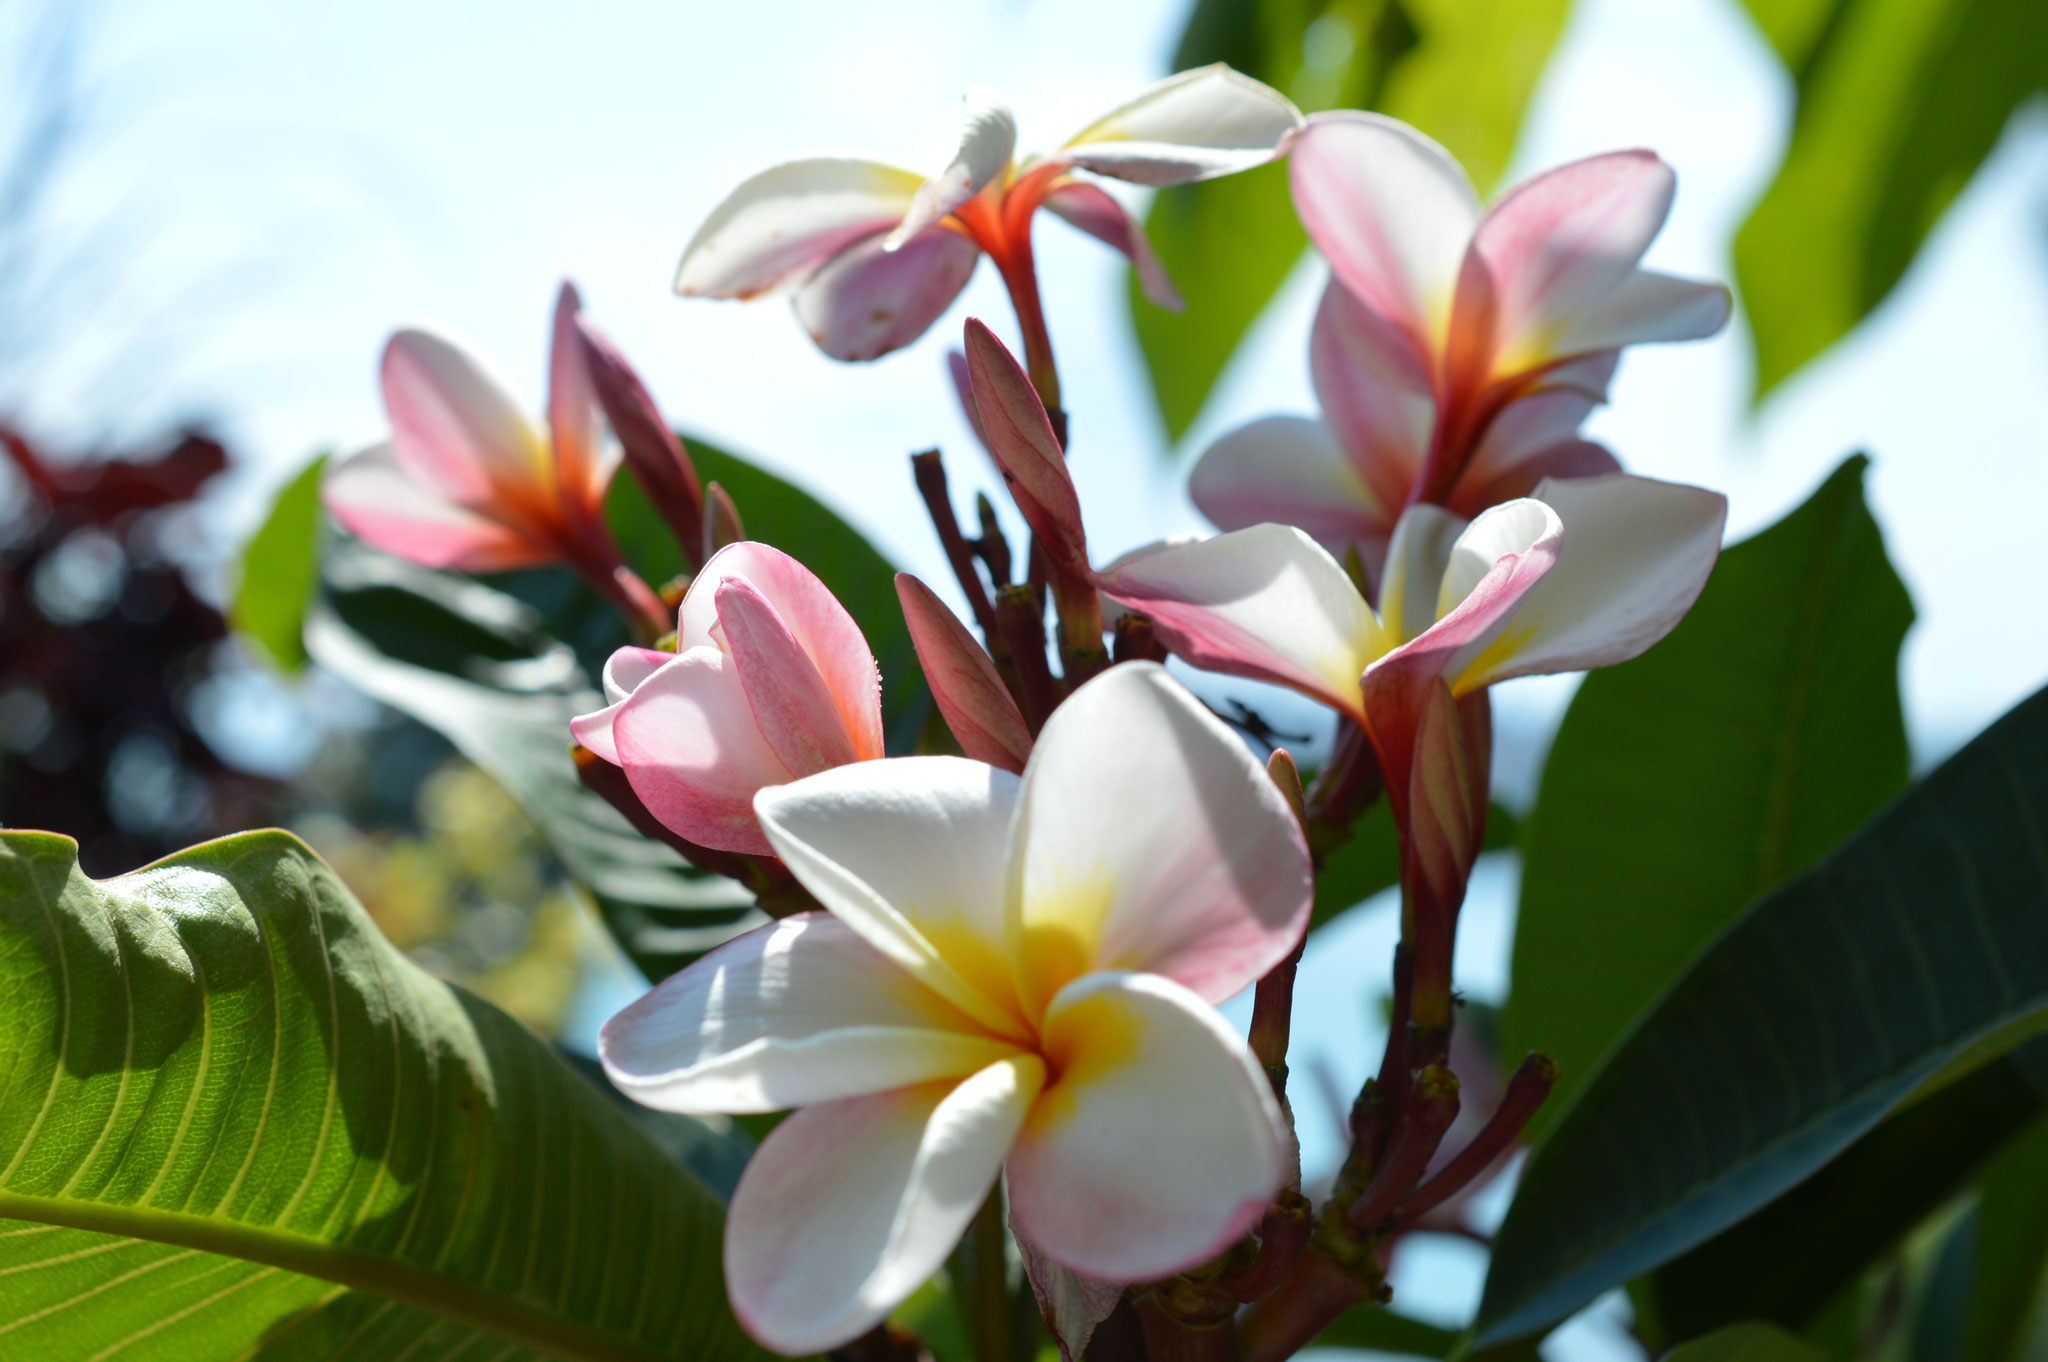 Blühte einer Plumeria / Frangipani